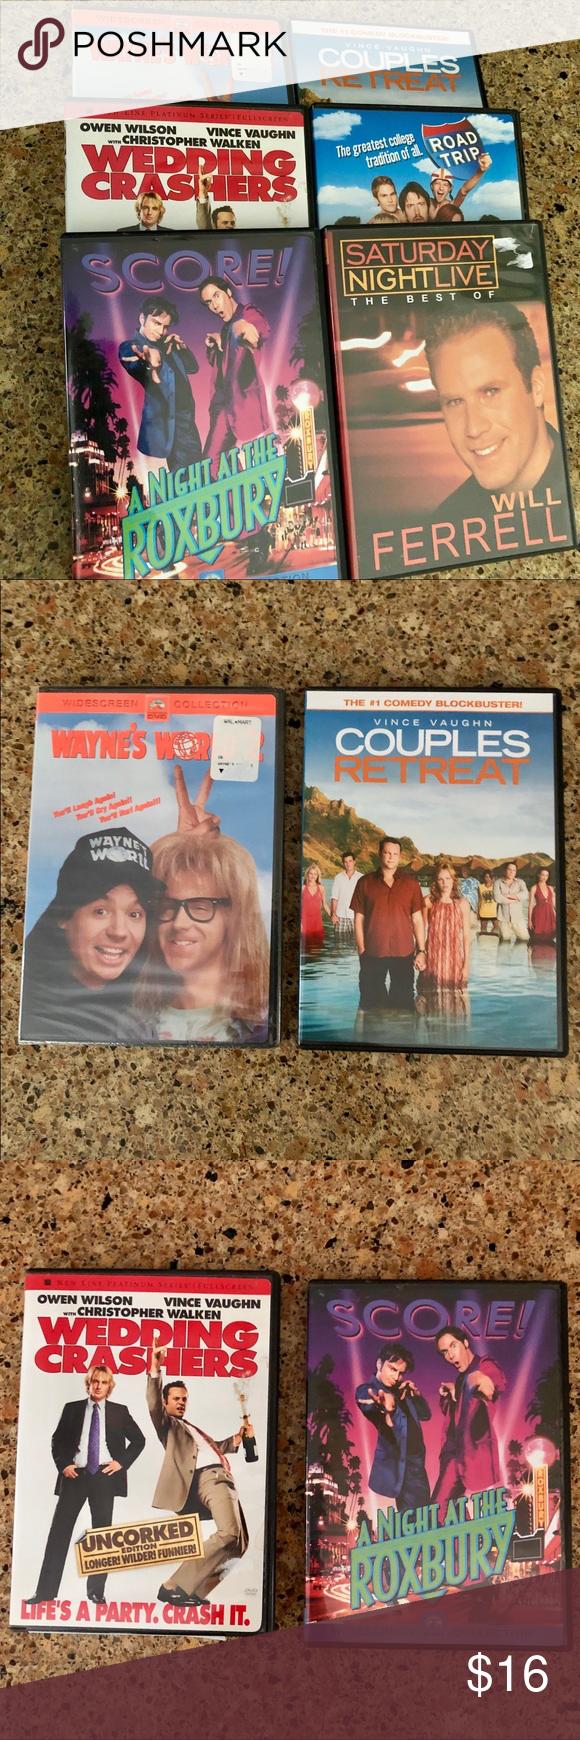 Six Comedy DVDs Six DVDs including Wayne's World 2